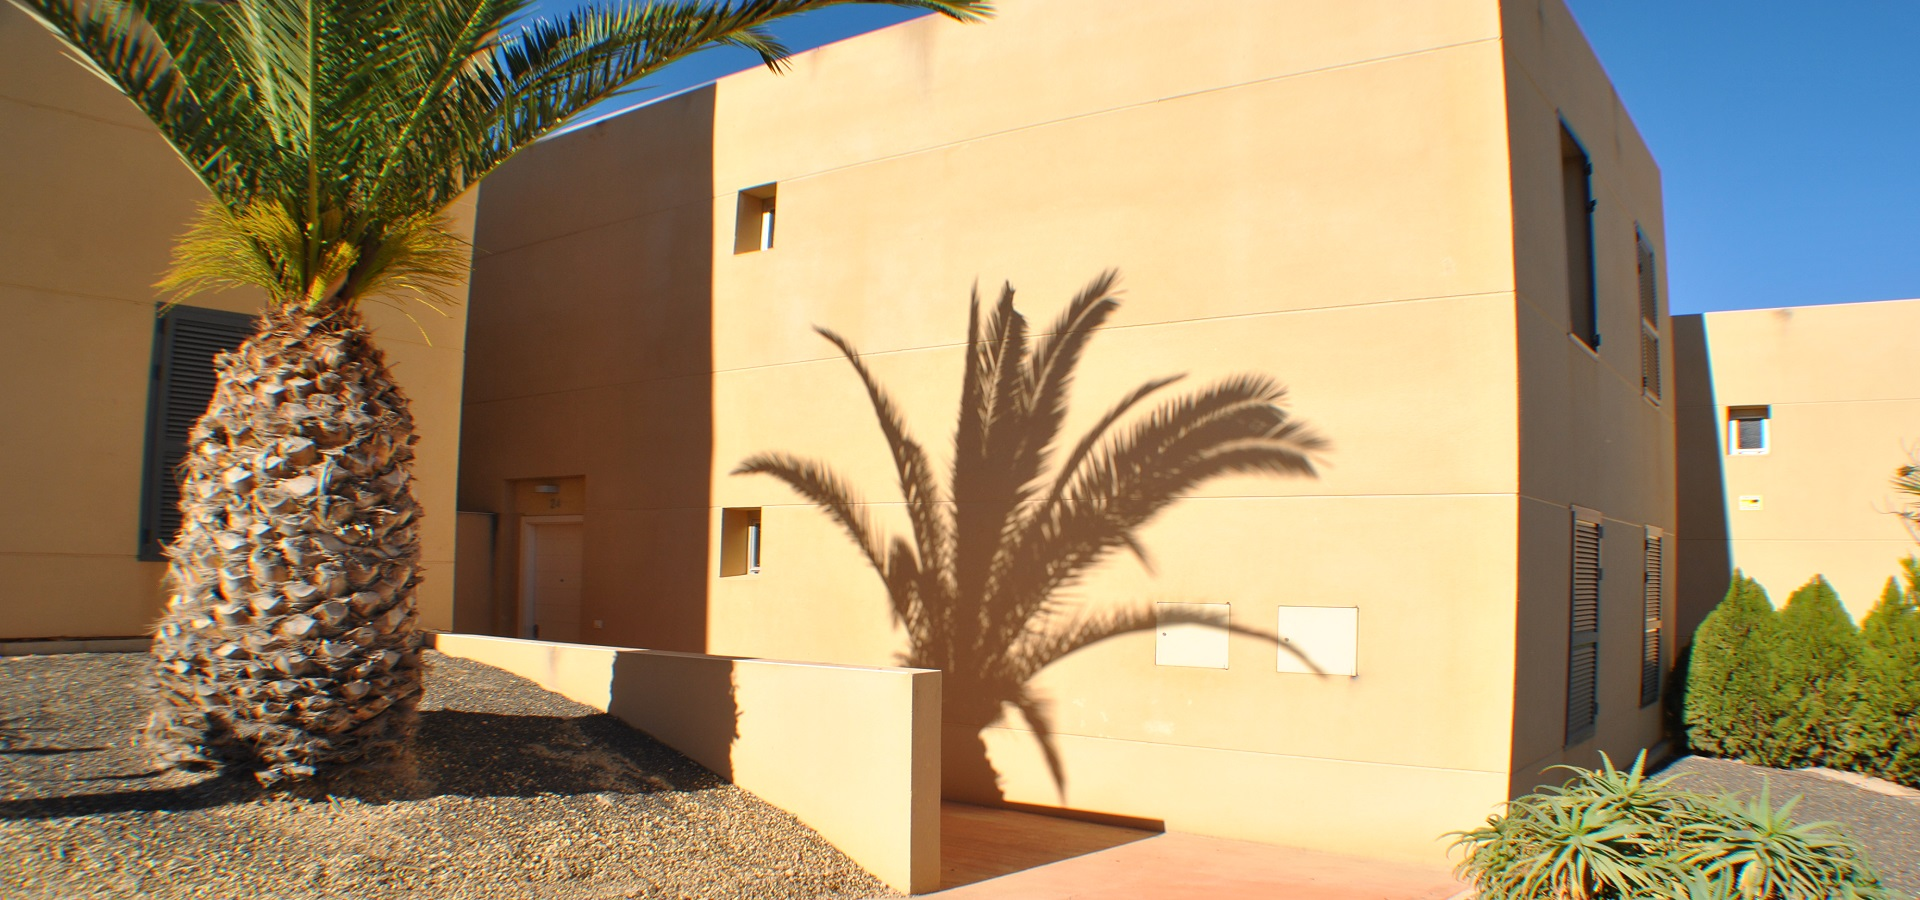 4 Bedroom Villa For Sale Antas Premium Properties